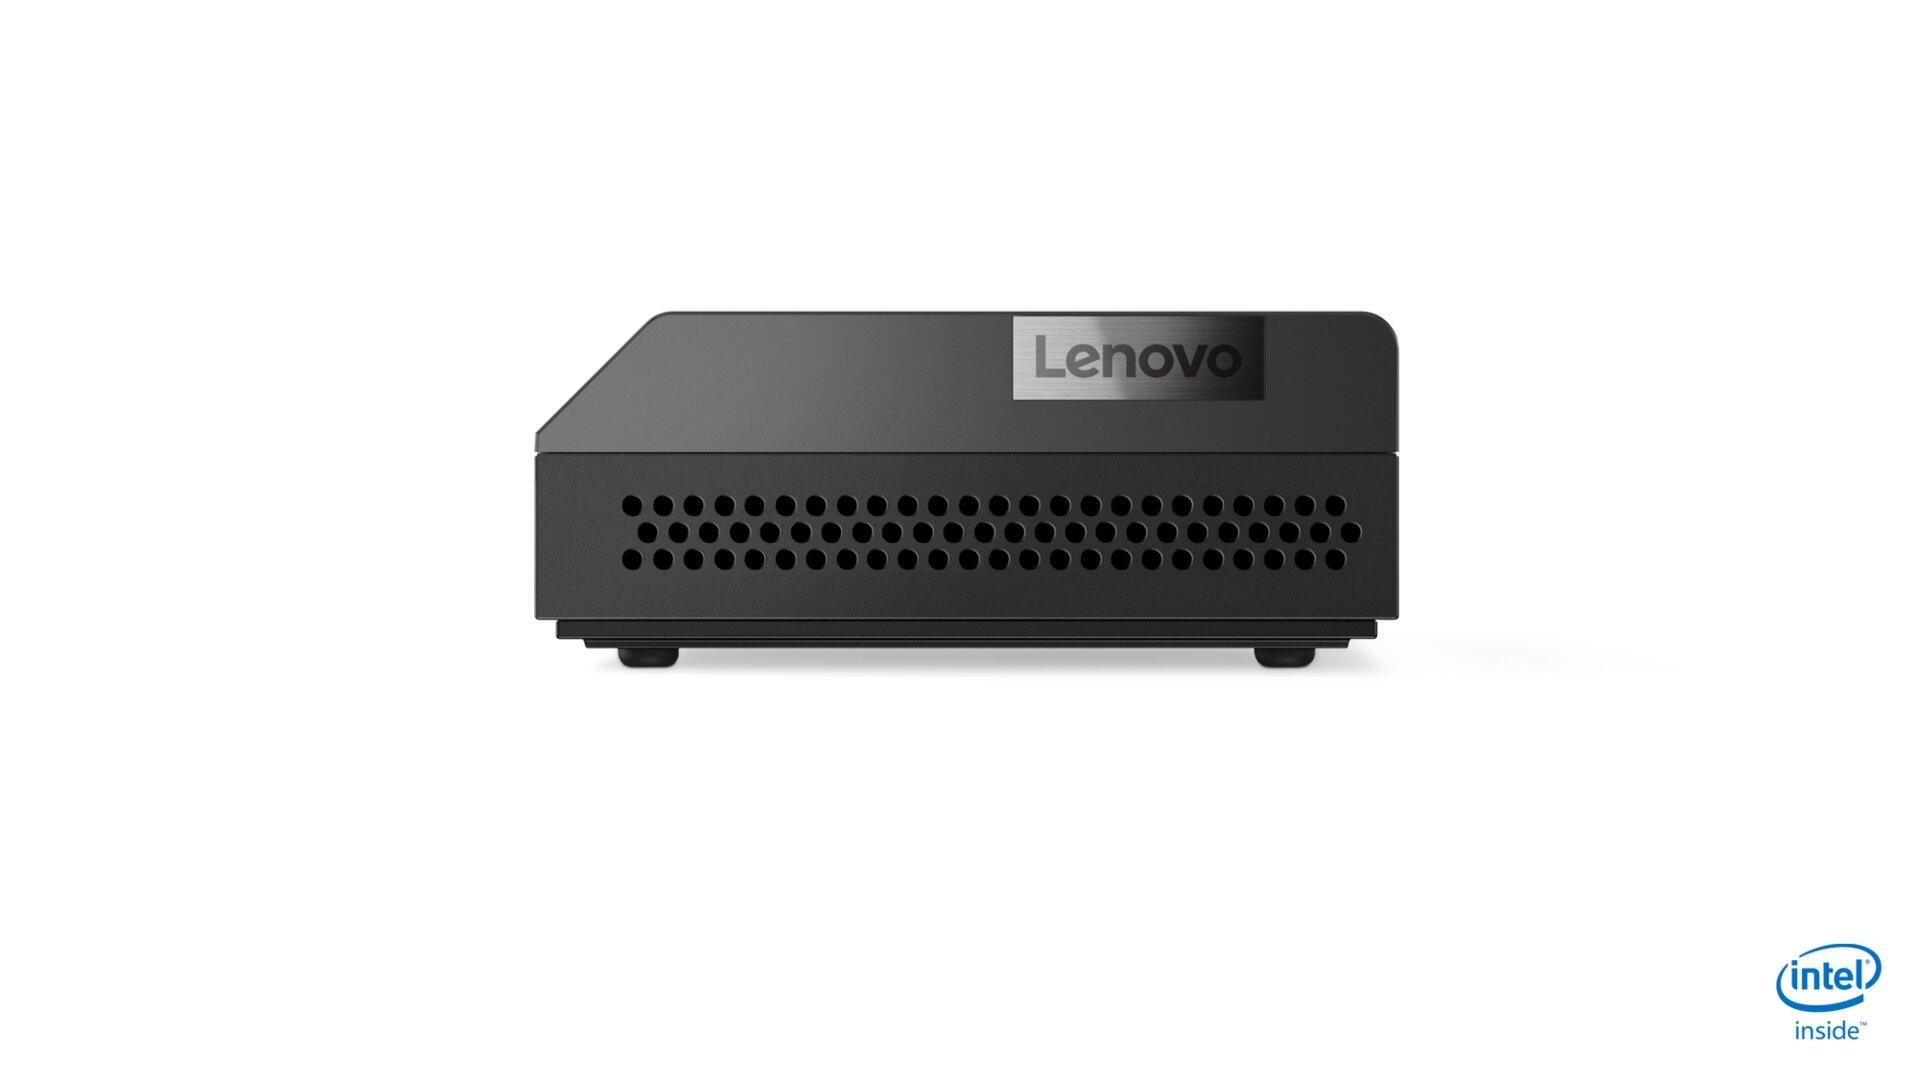 Lenovo ThinkCentre M90n Nano (IoT)